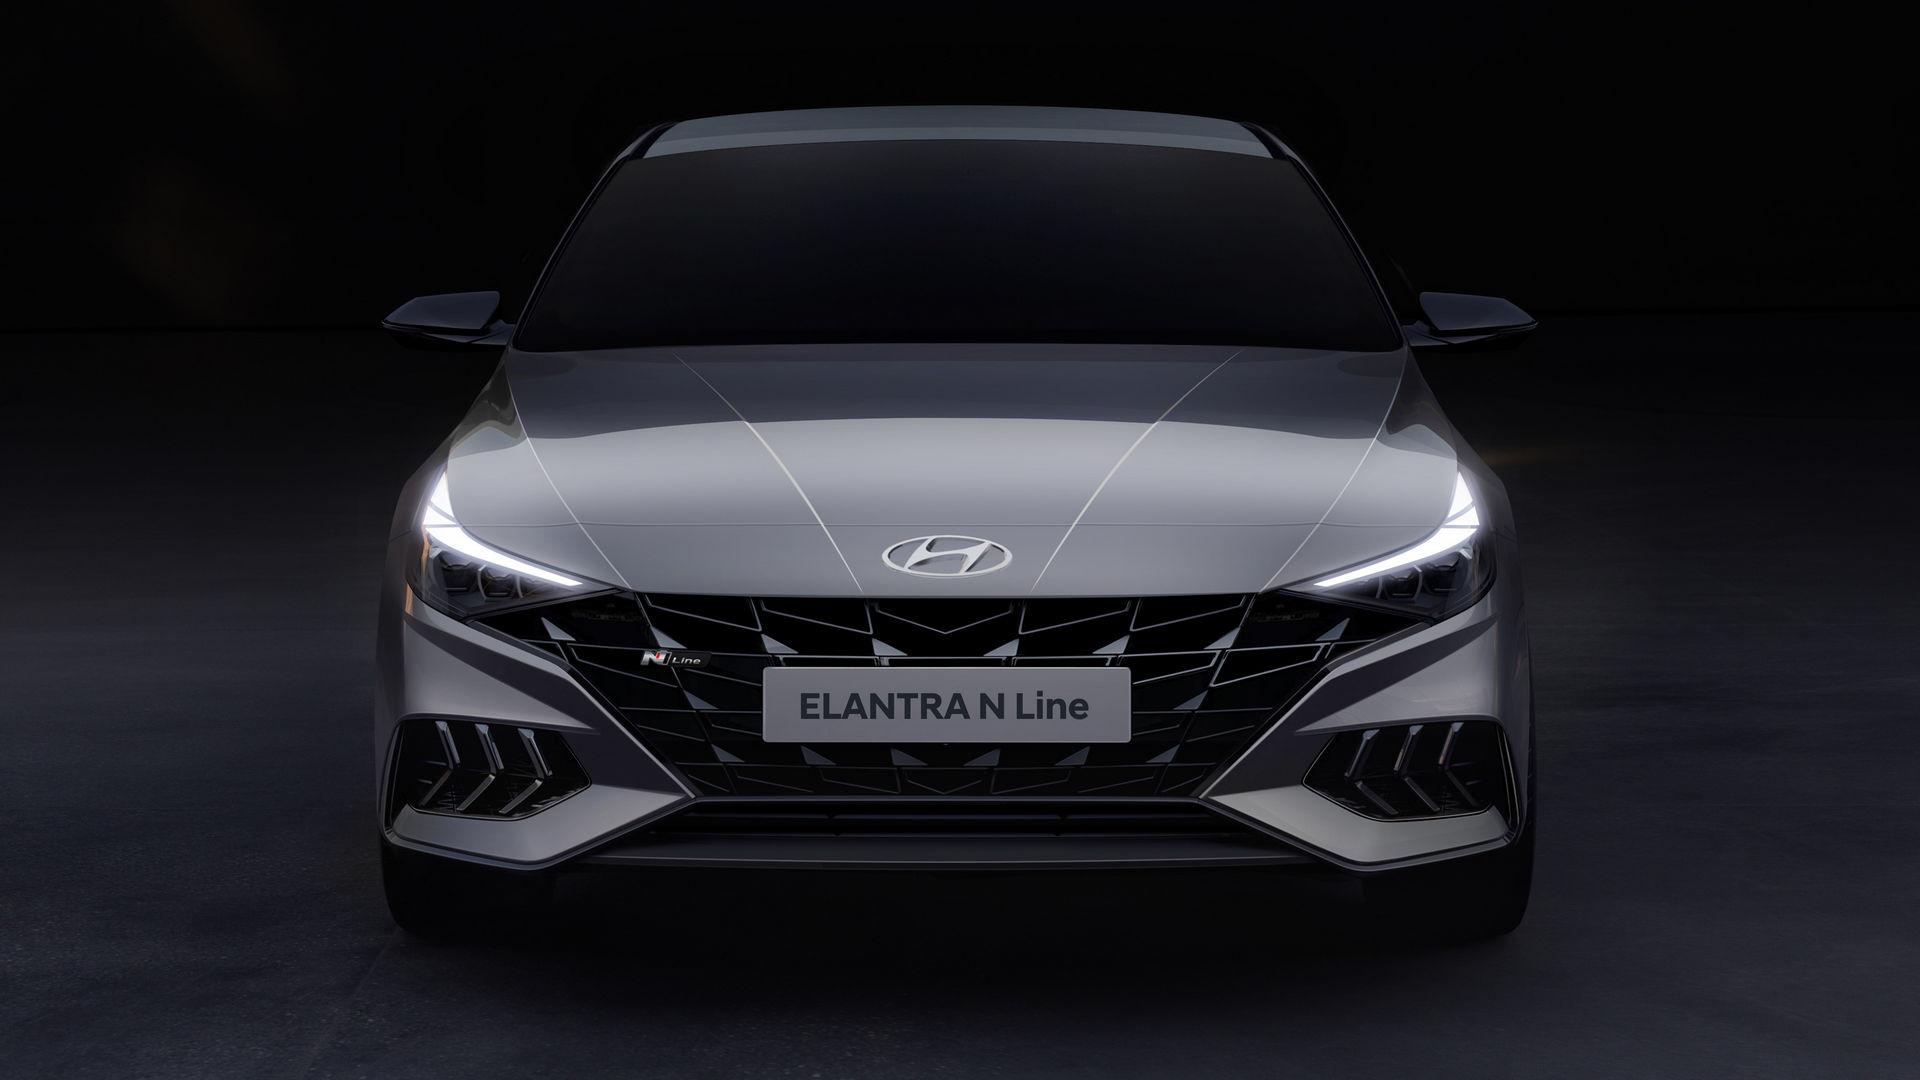 Hyundai-Elantra-N-Line-2021-2